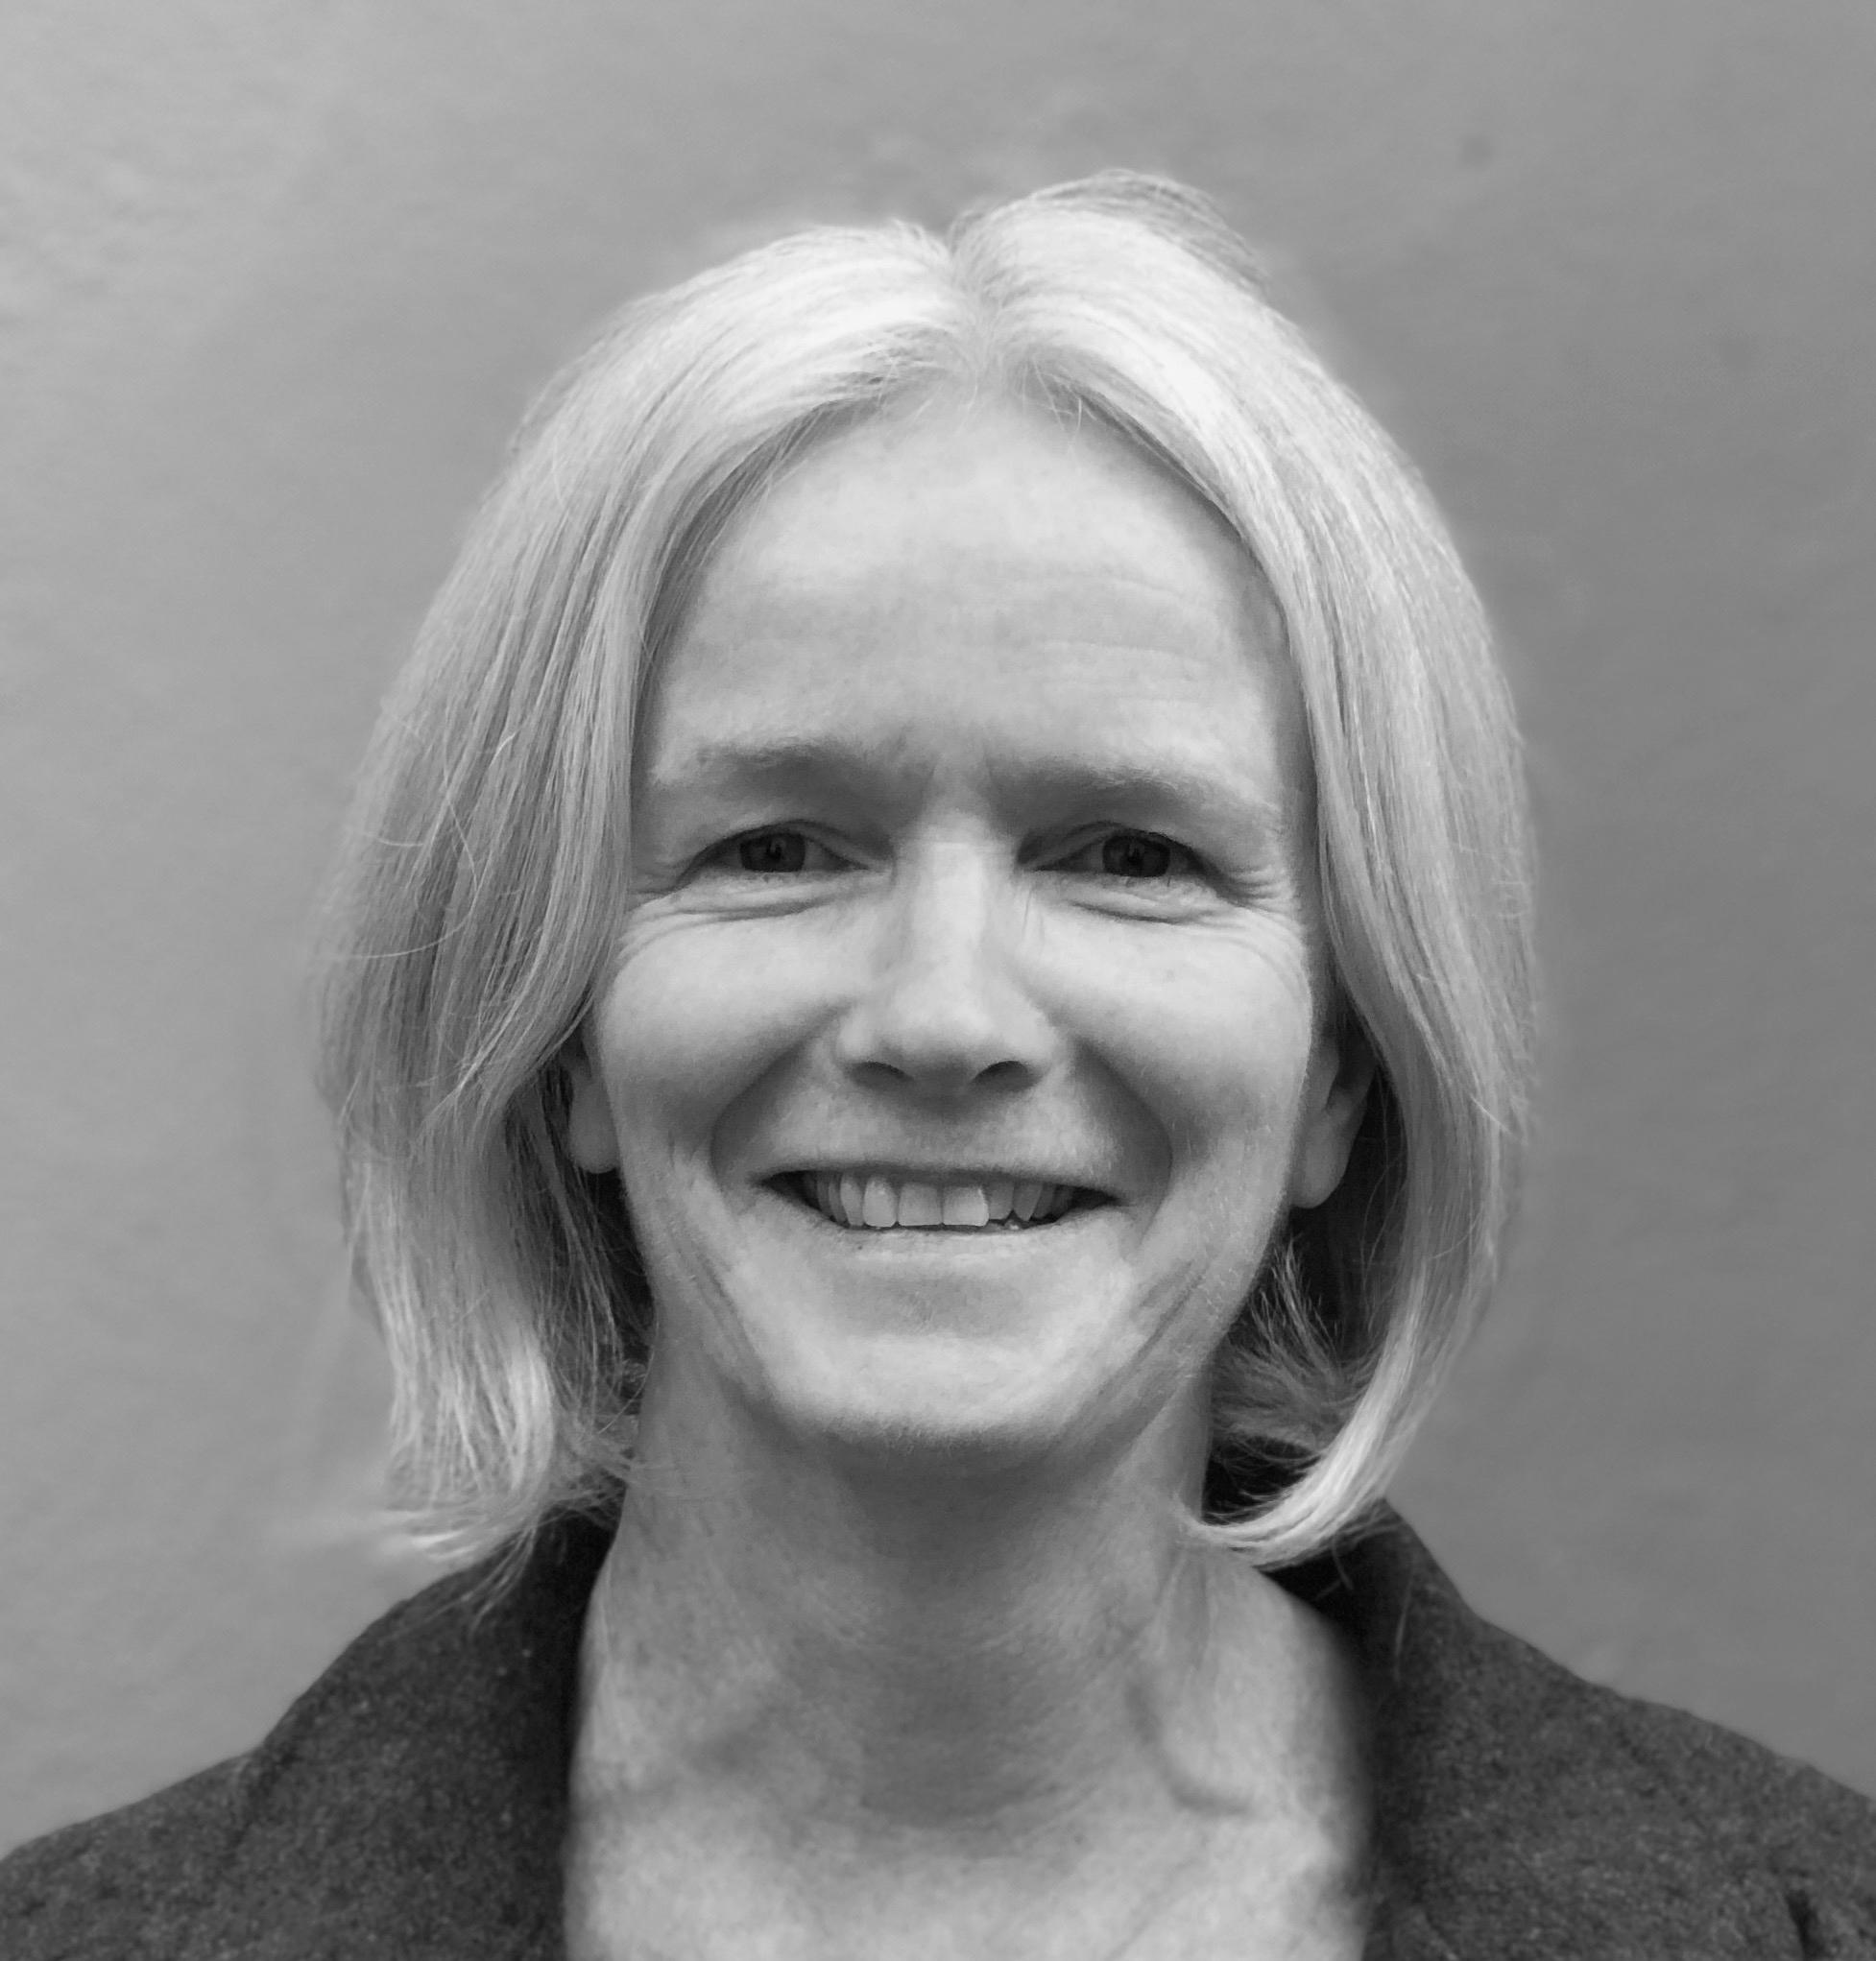 Chair of Trustees - Director, Curriculum Development